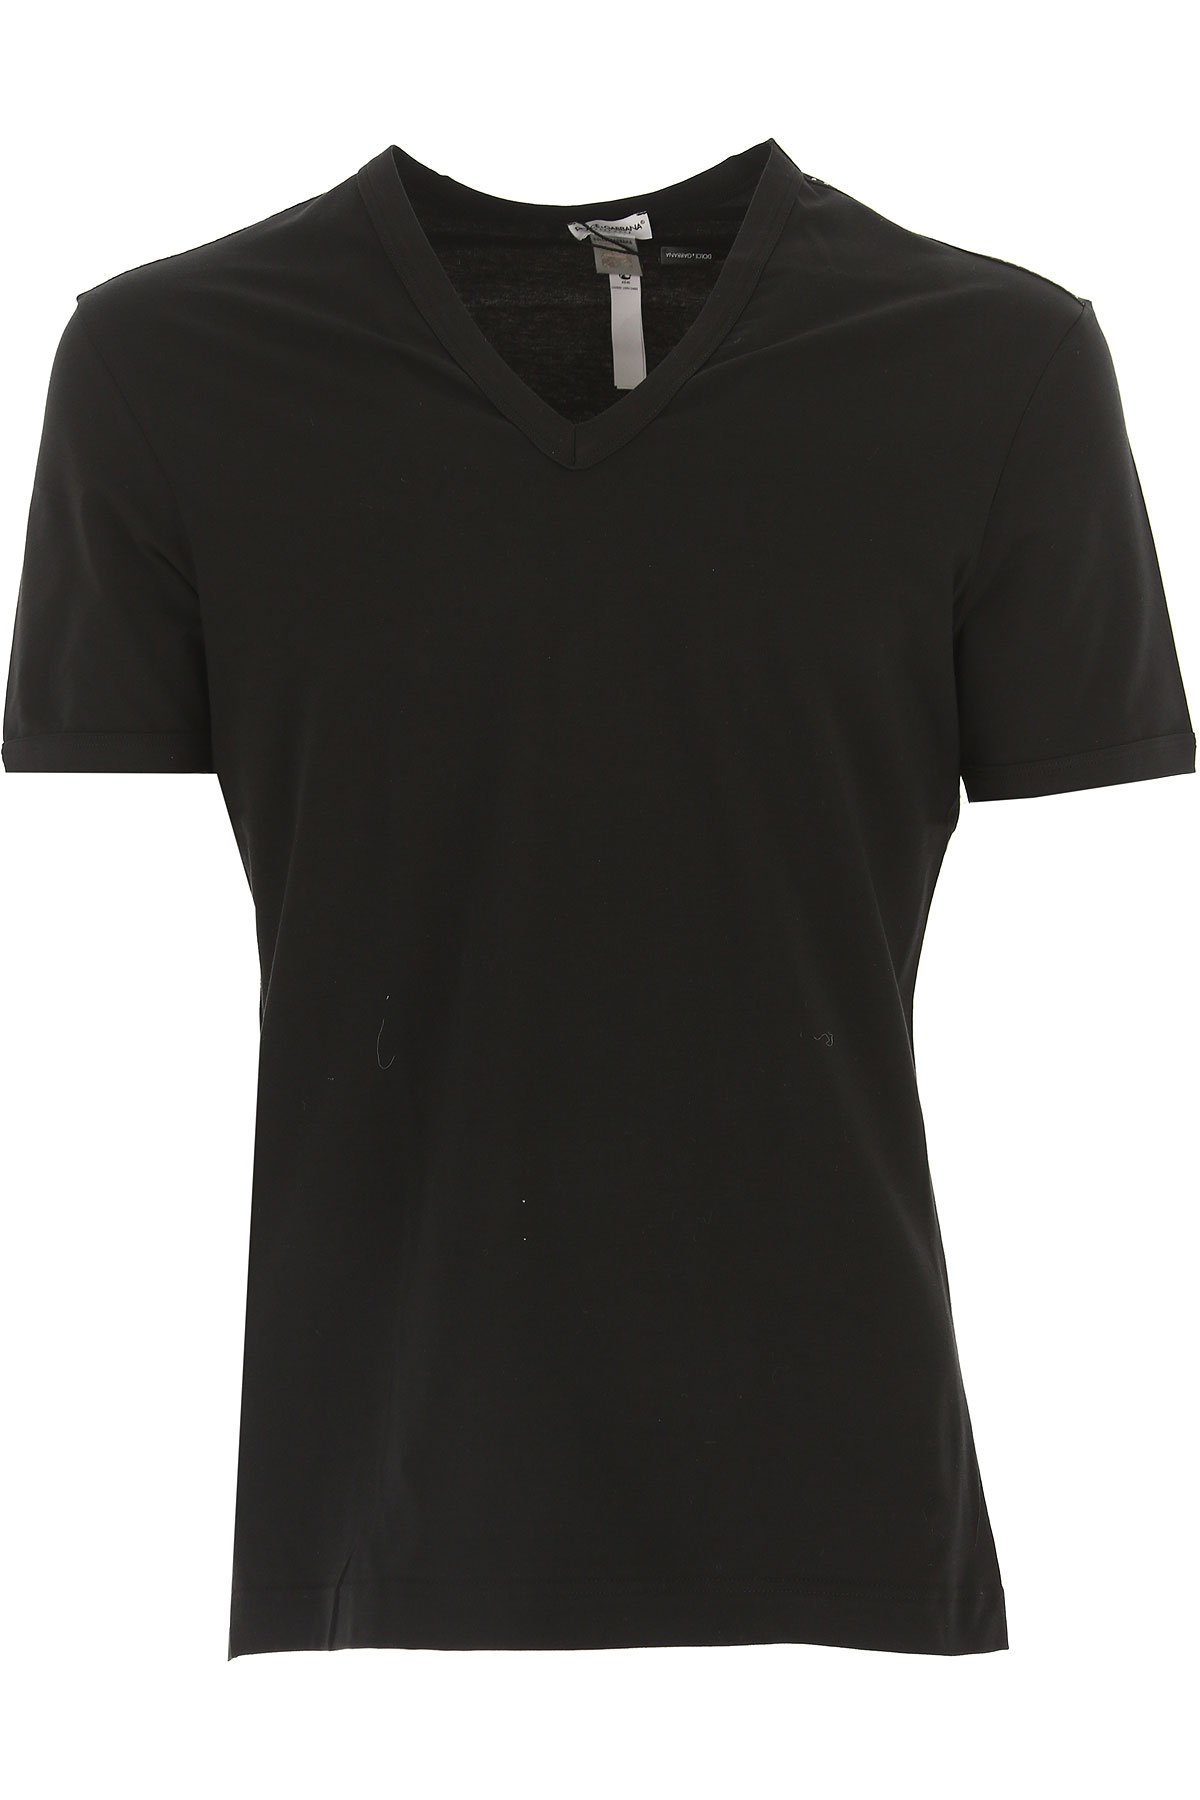 Image of Dolce & Gabbana T-Shirt for Men On Sale in Outlet, Black, Pima Cotton, 2017, S (EU 3) M (EU 4)